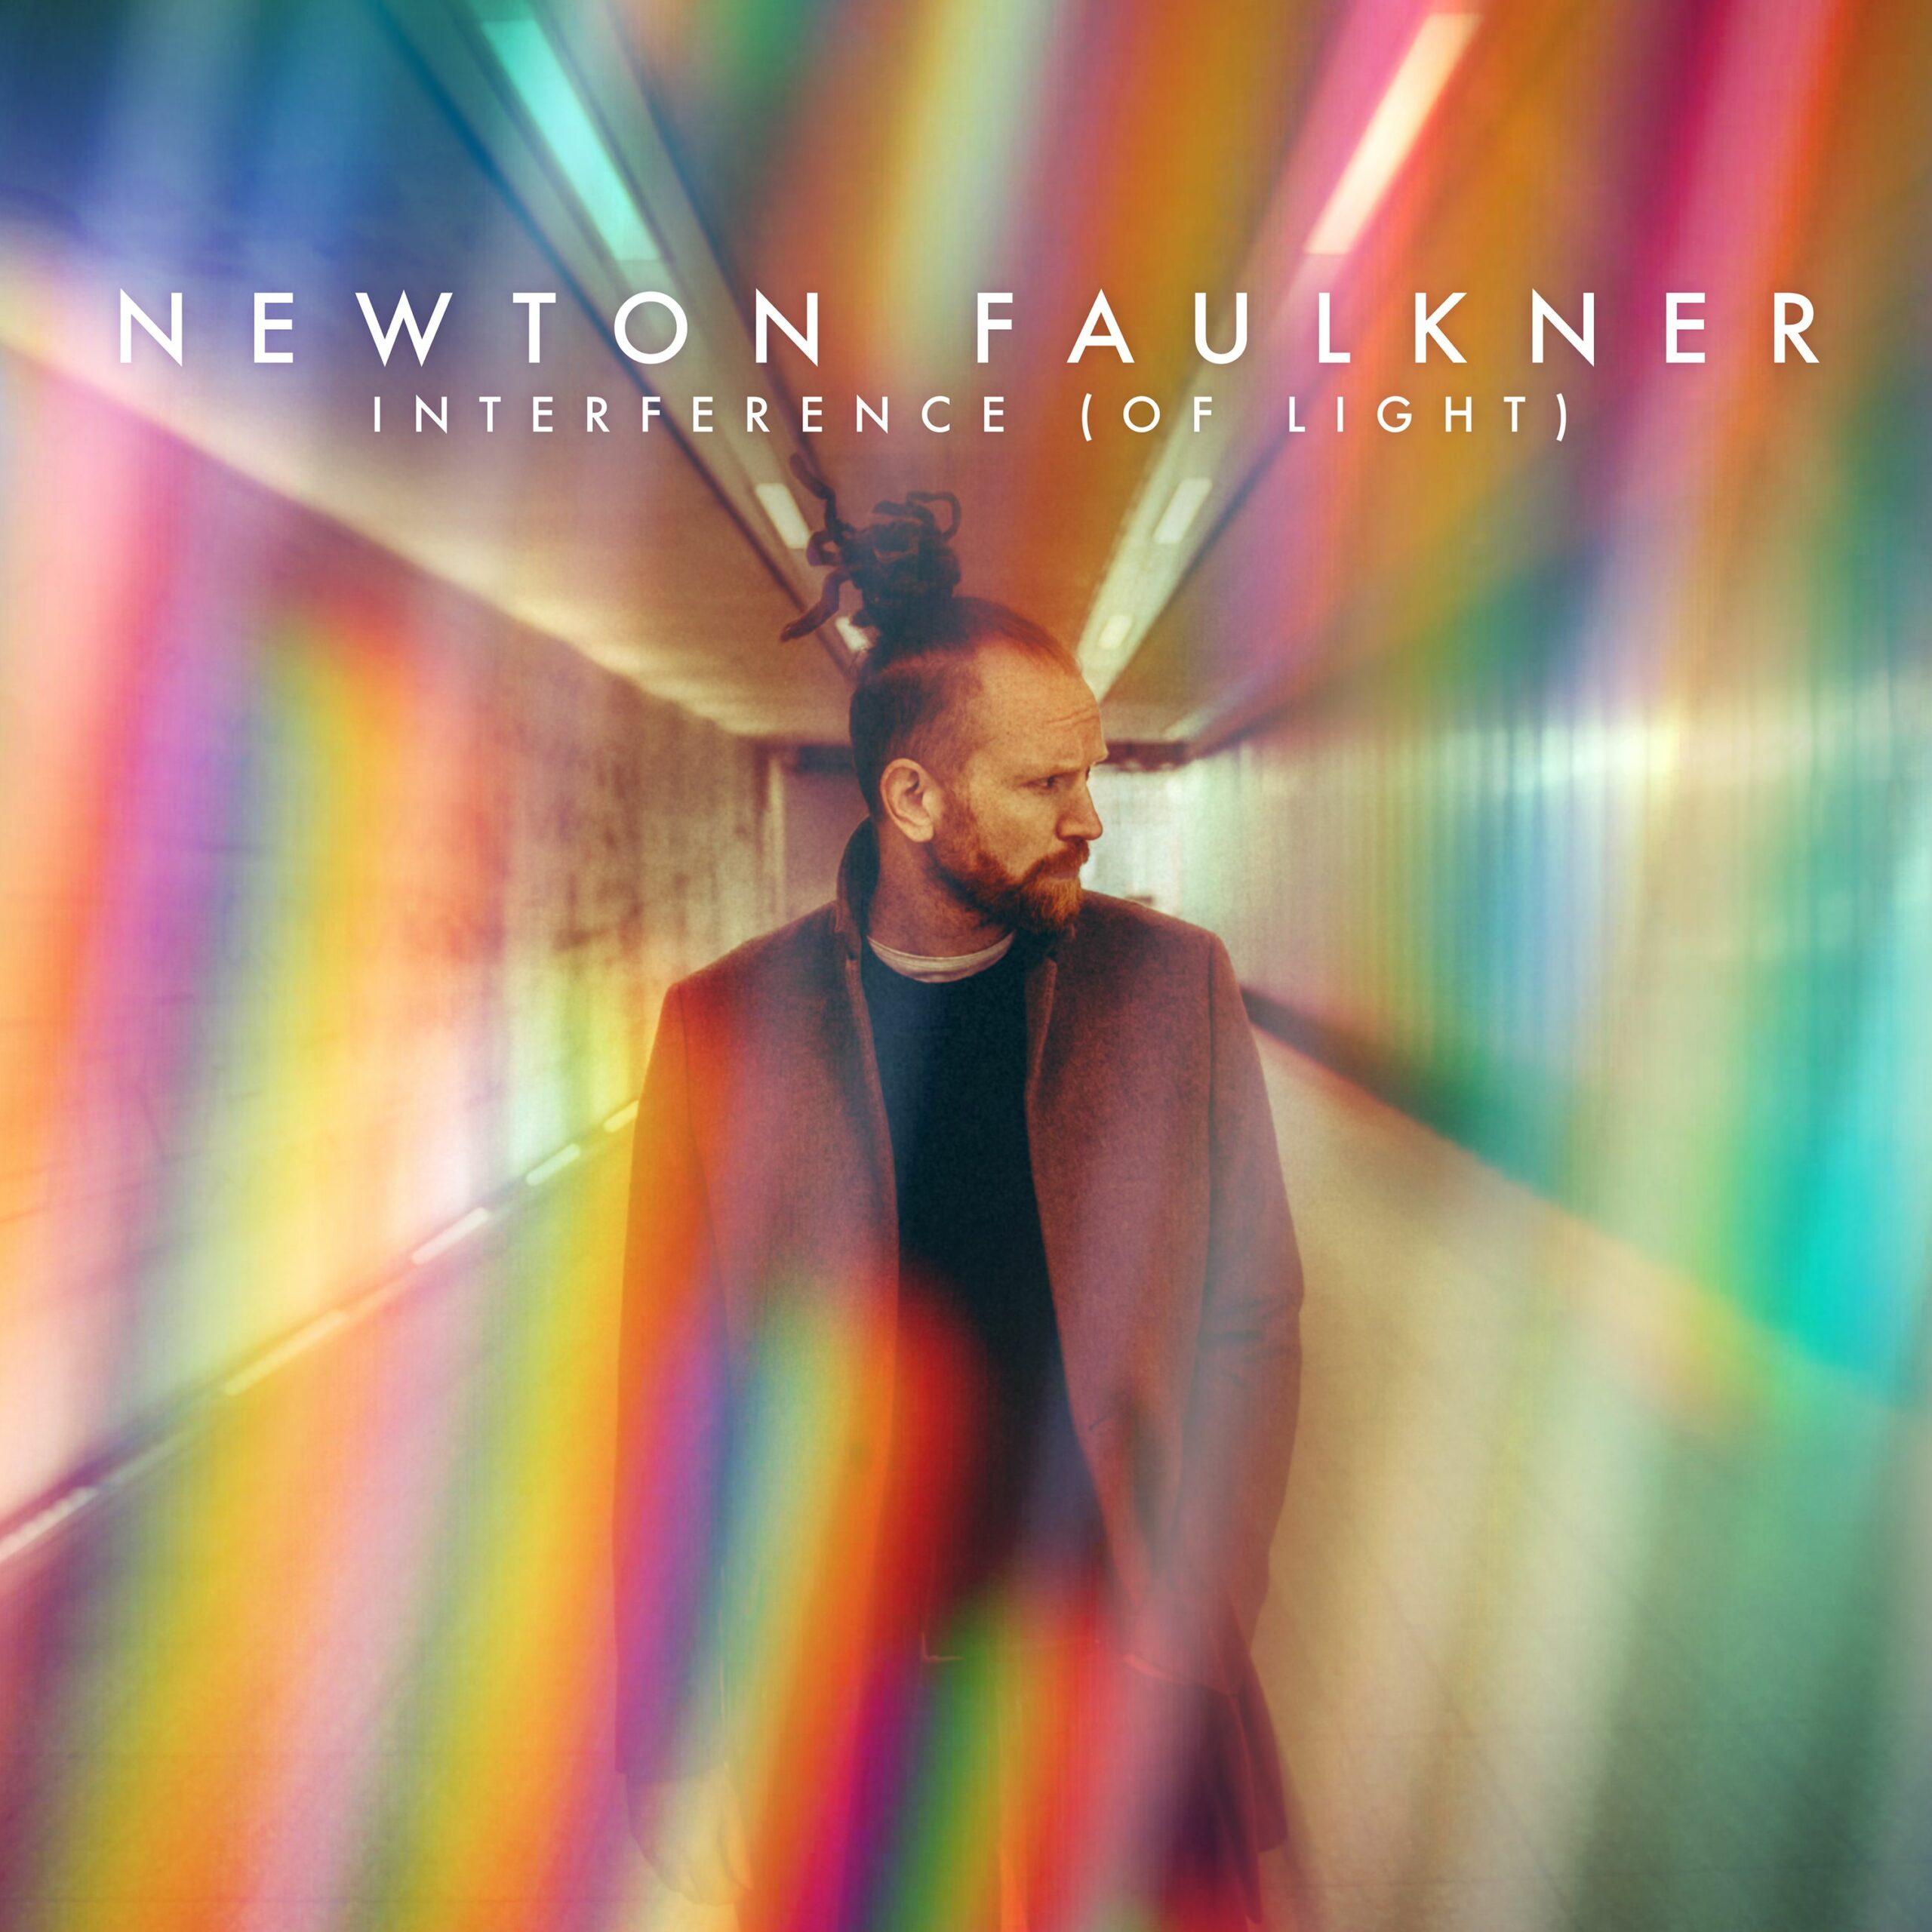 NEWS: Newton Faulkner returns with new album and tour dates